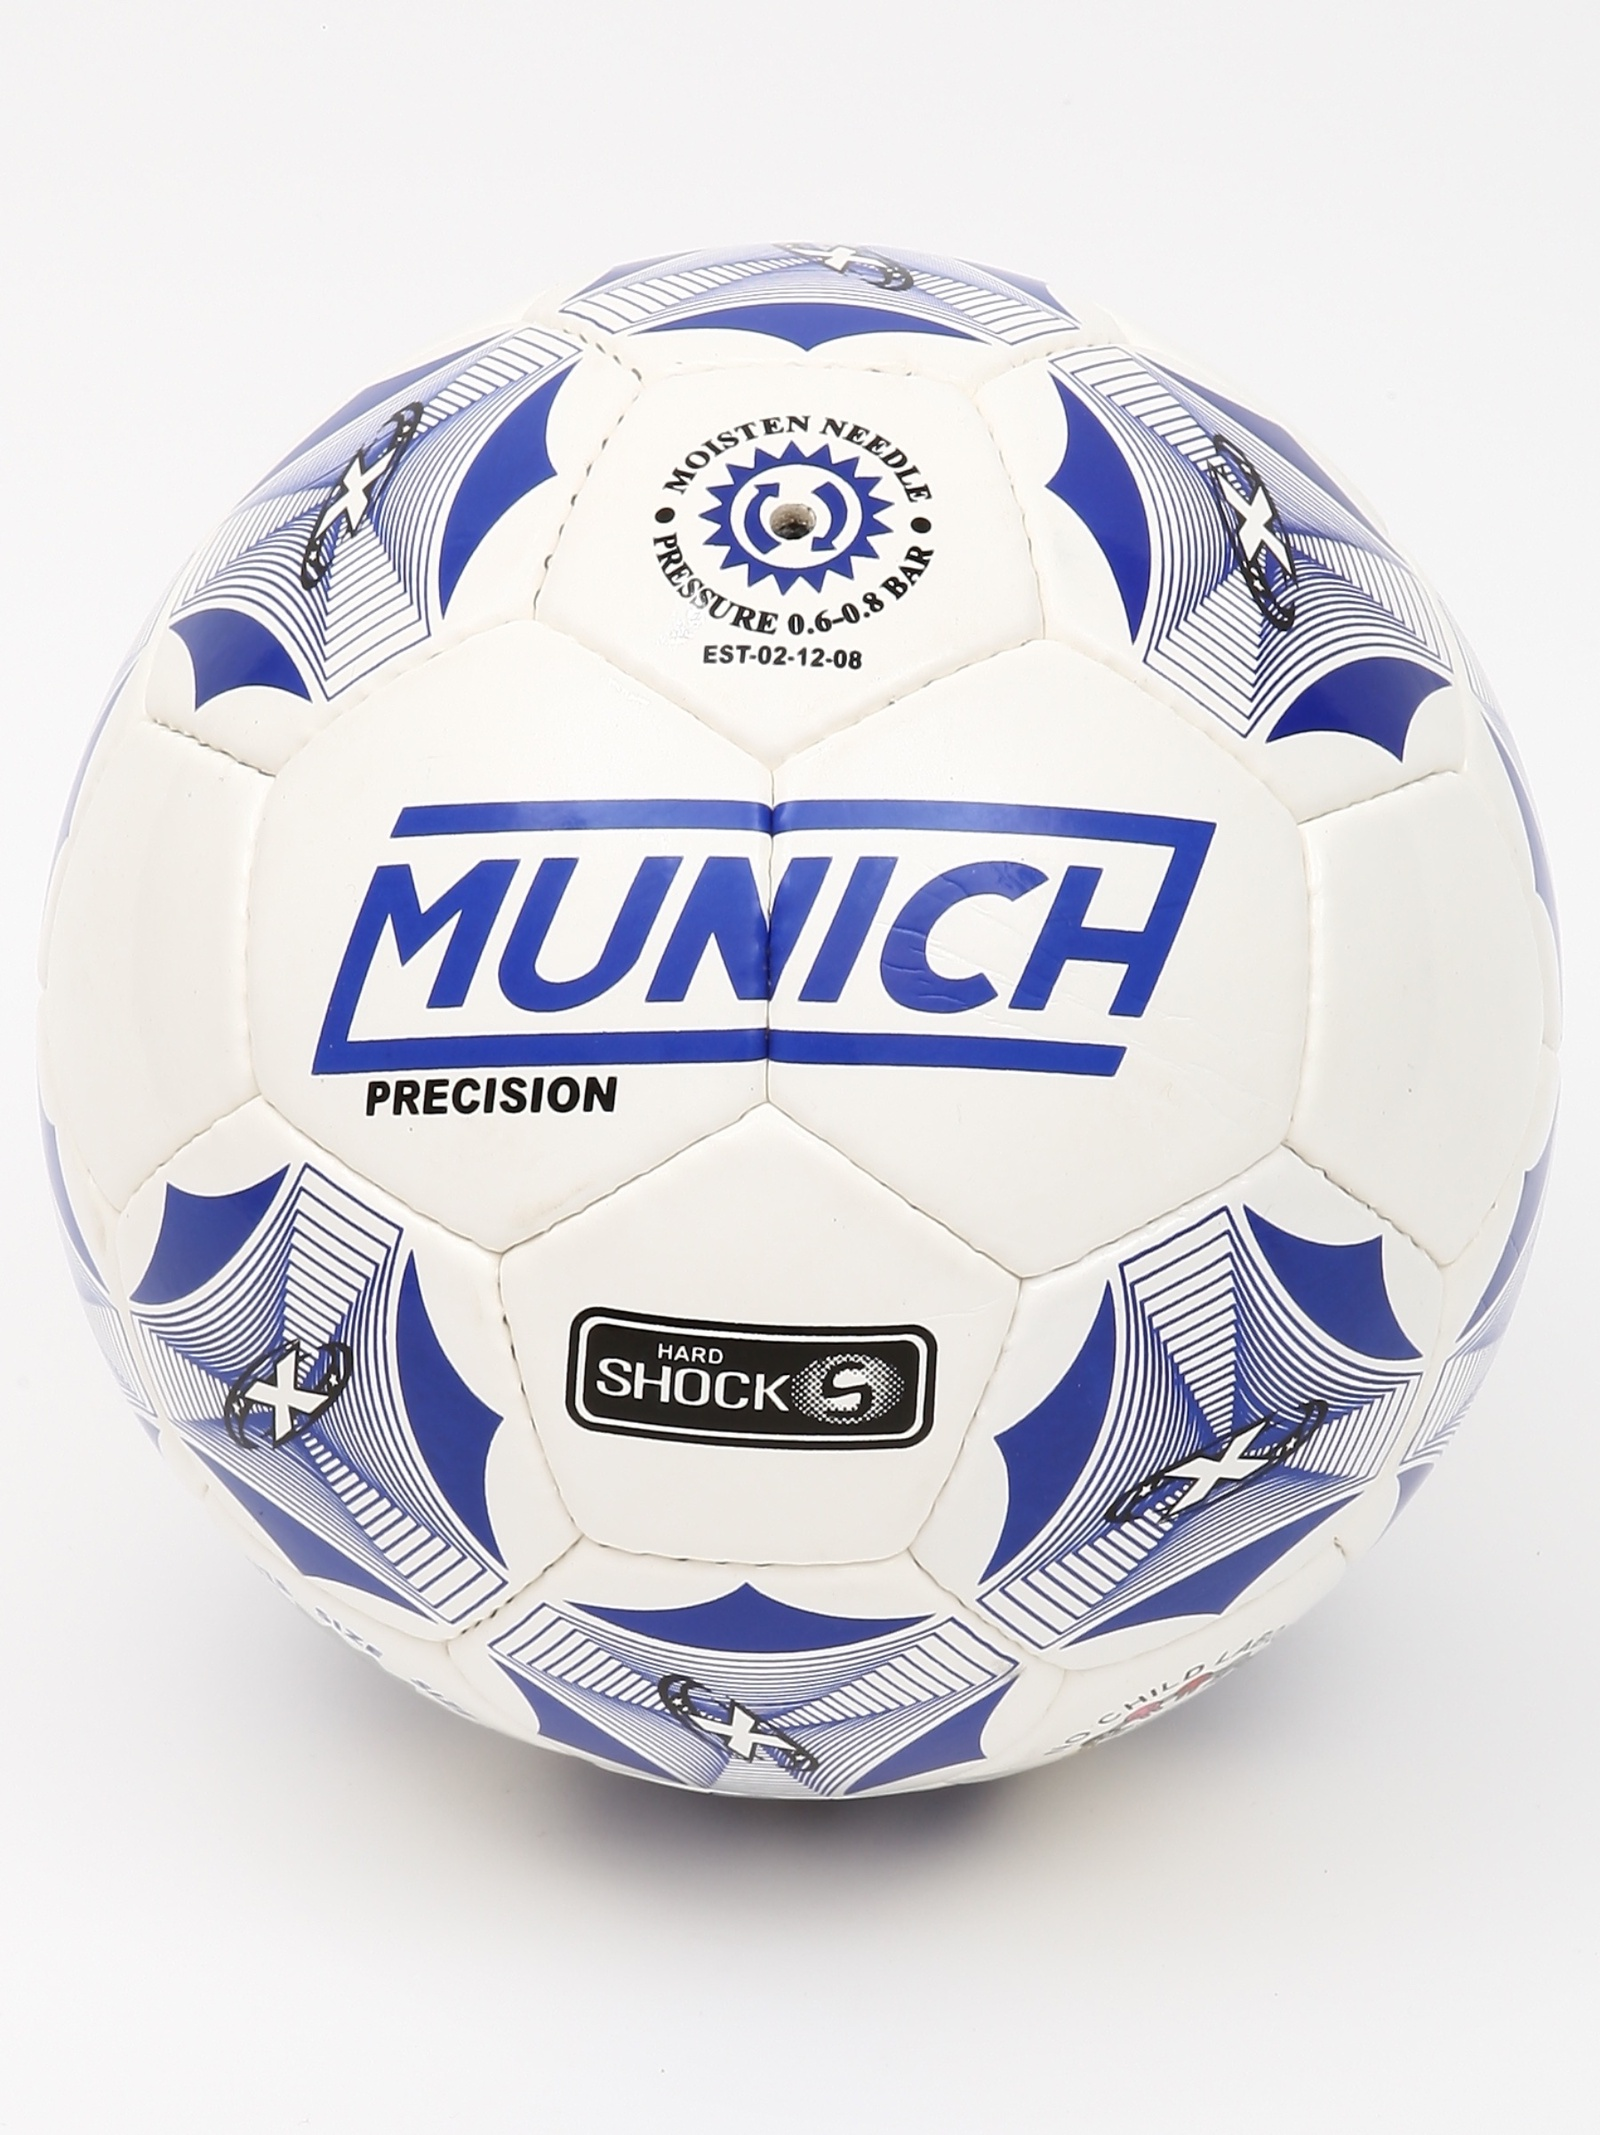 Мяч футбольный MUNICH Мяч футбольный PRECISION №5 WHITE, белый гирлянда luazon метраж футбольный мяч 5m ed 20 220v white 2433914